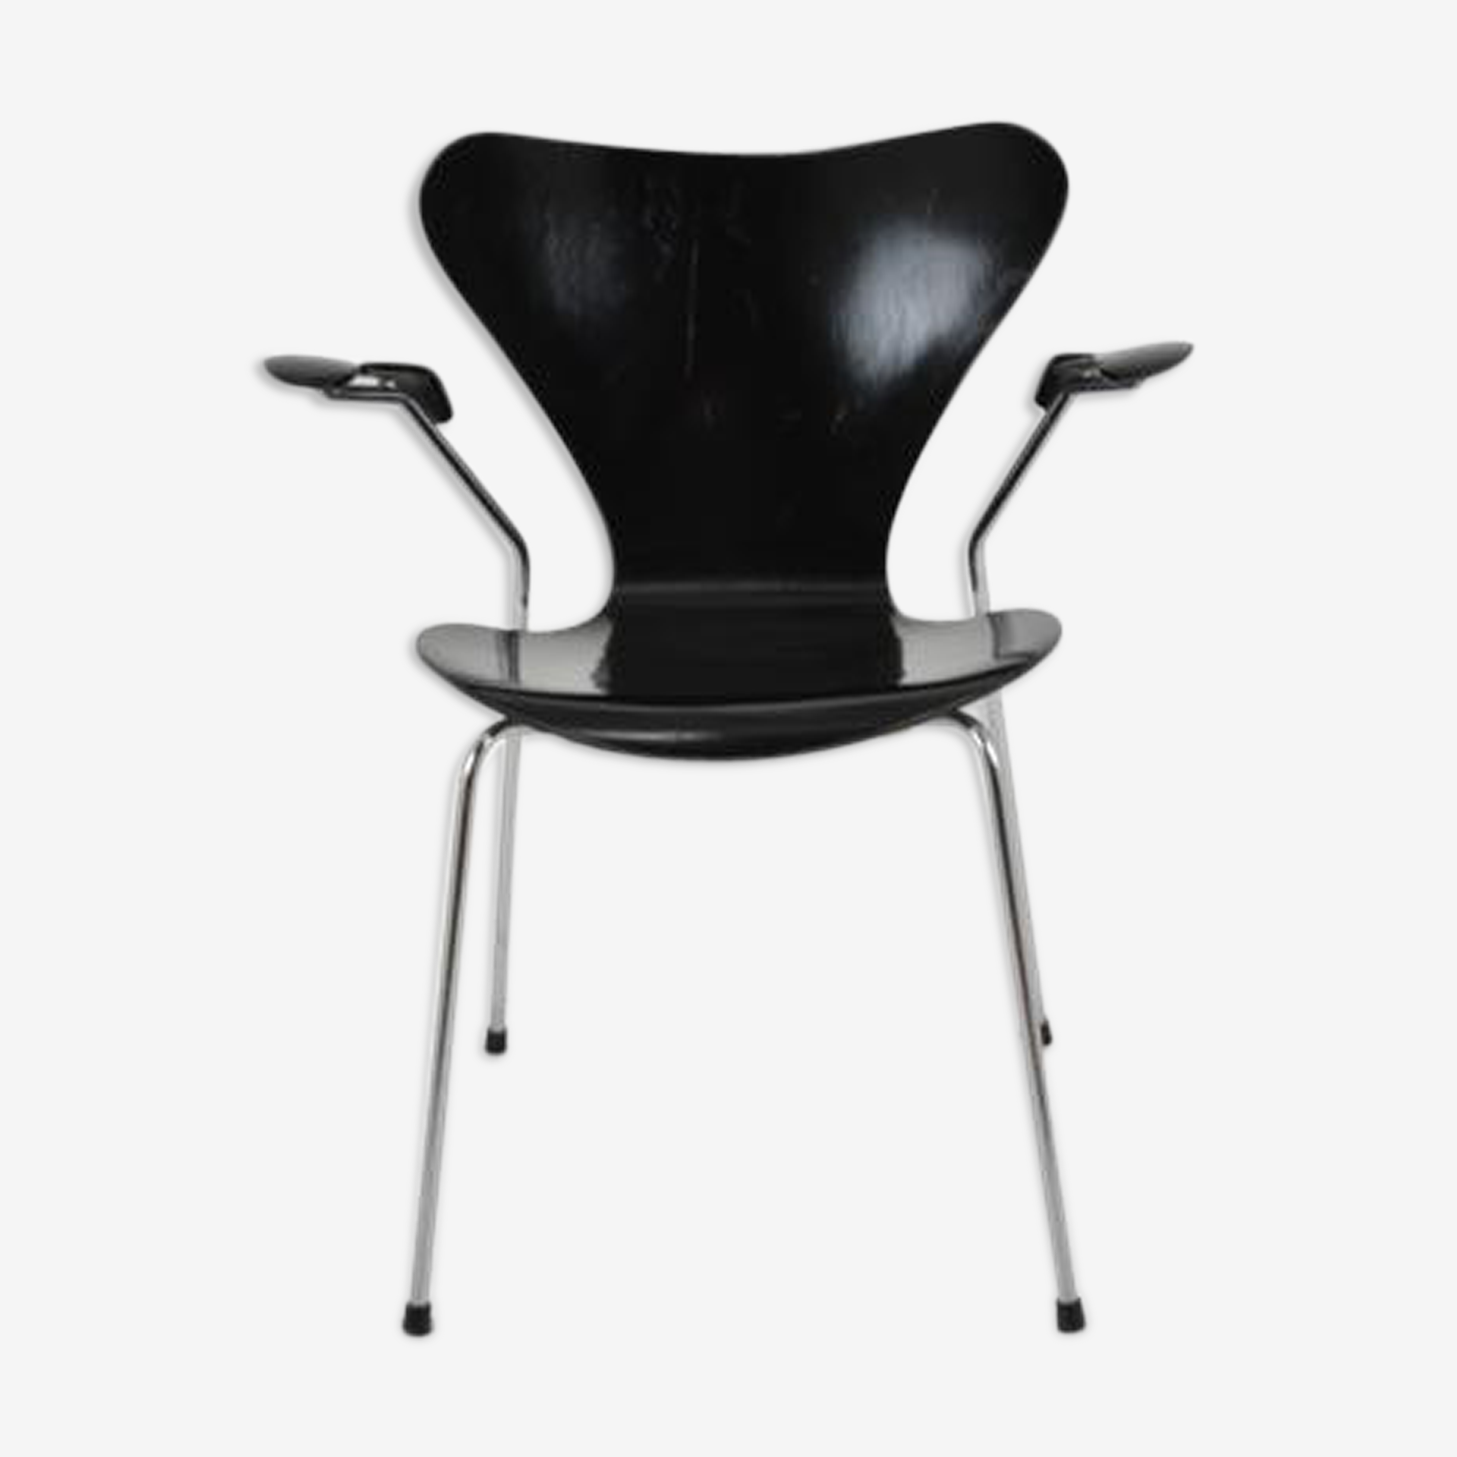 Series 7 armchair, Arne Jacobsen edited by Fritz Hansen 1982